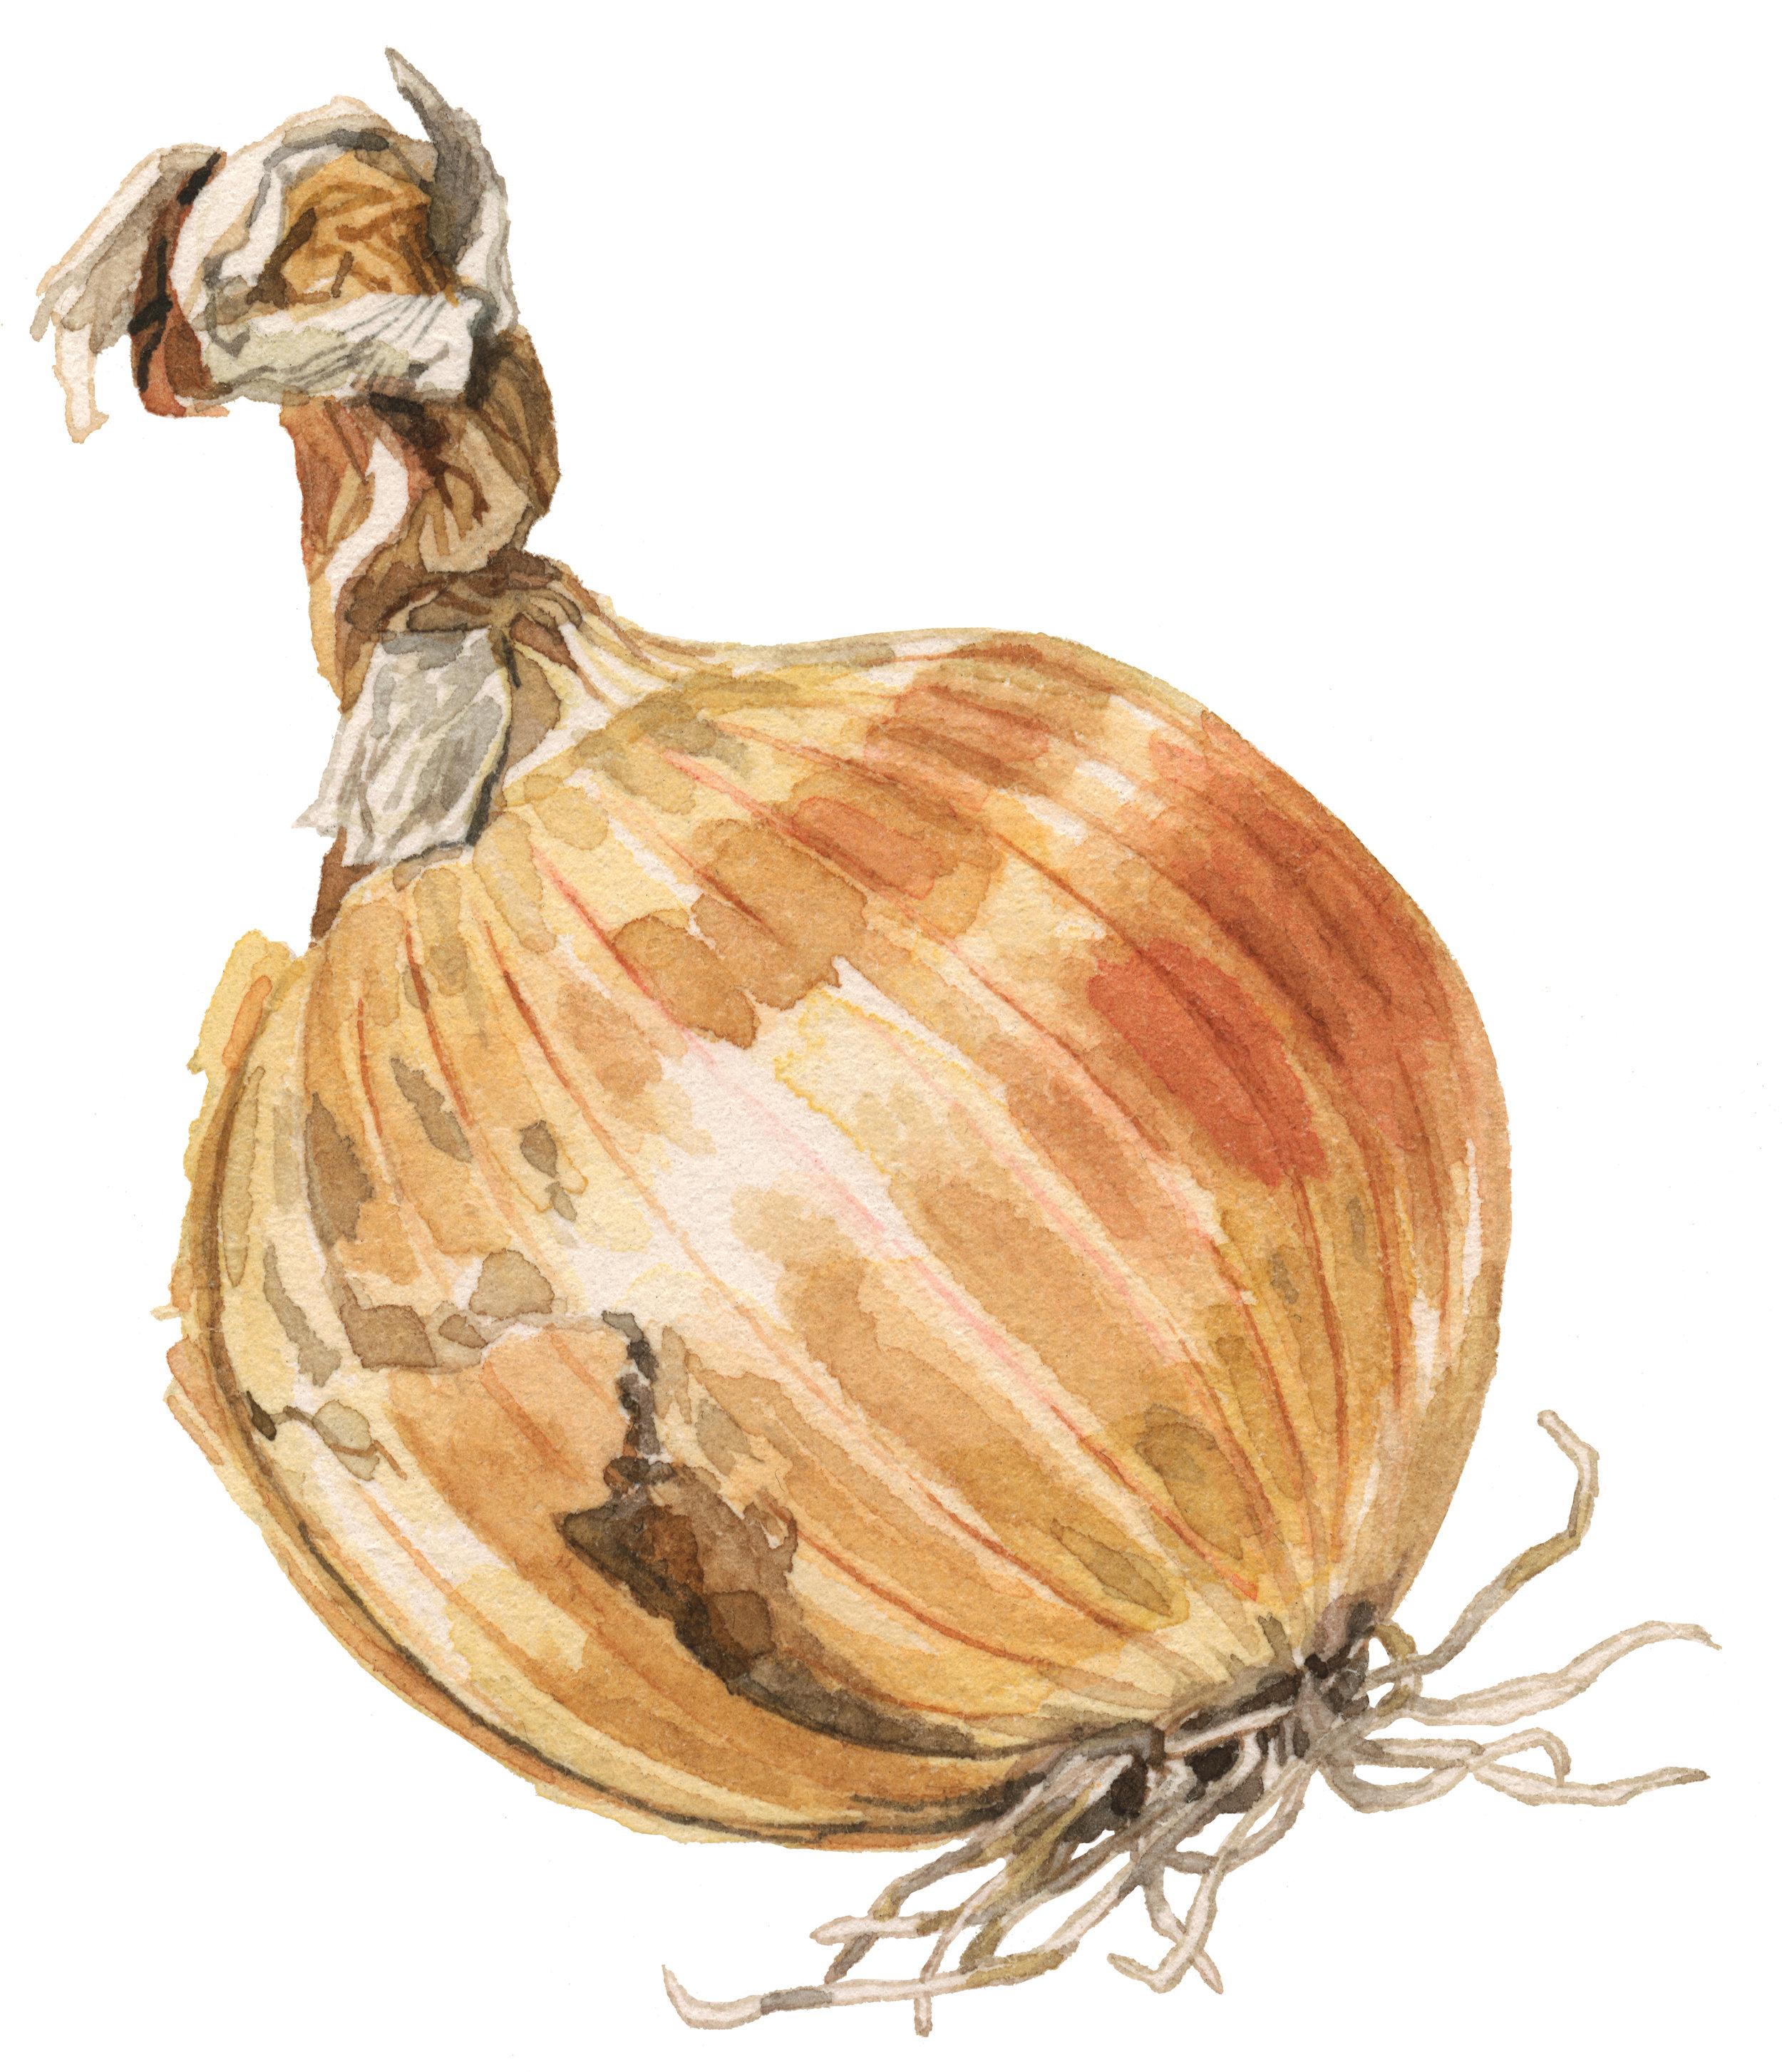 35-onion-storage-lrg.jpg